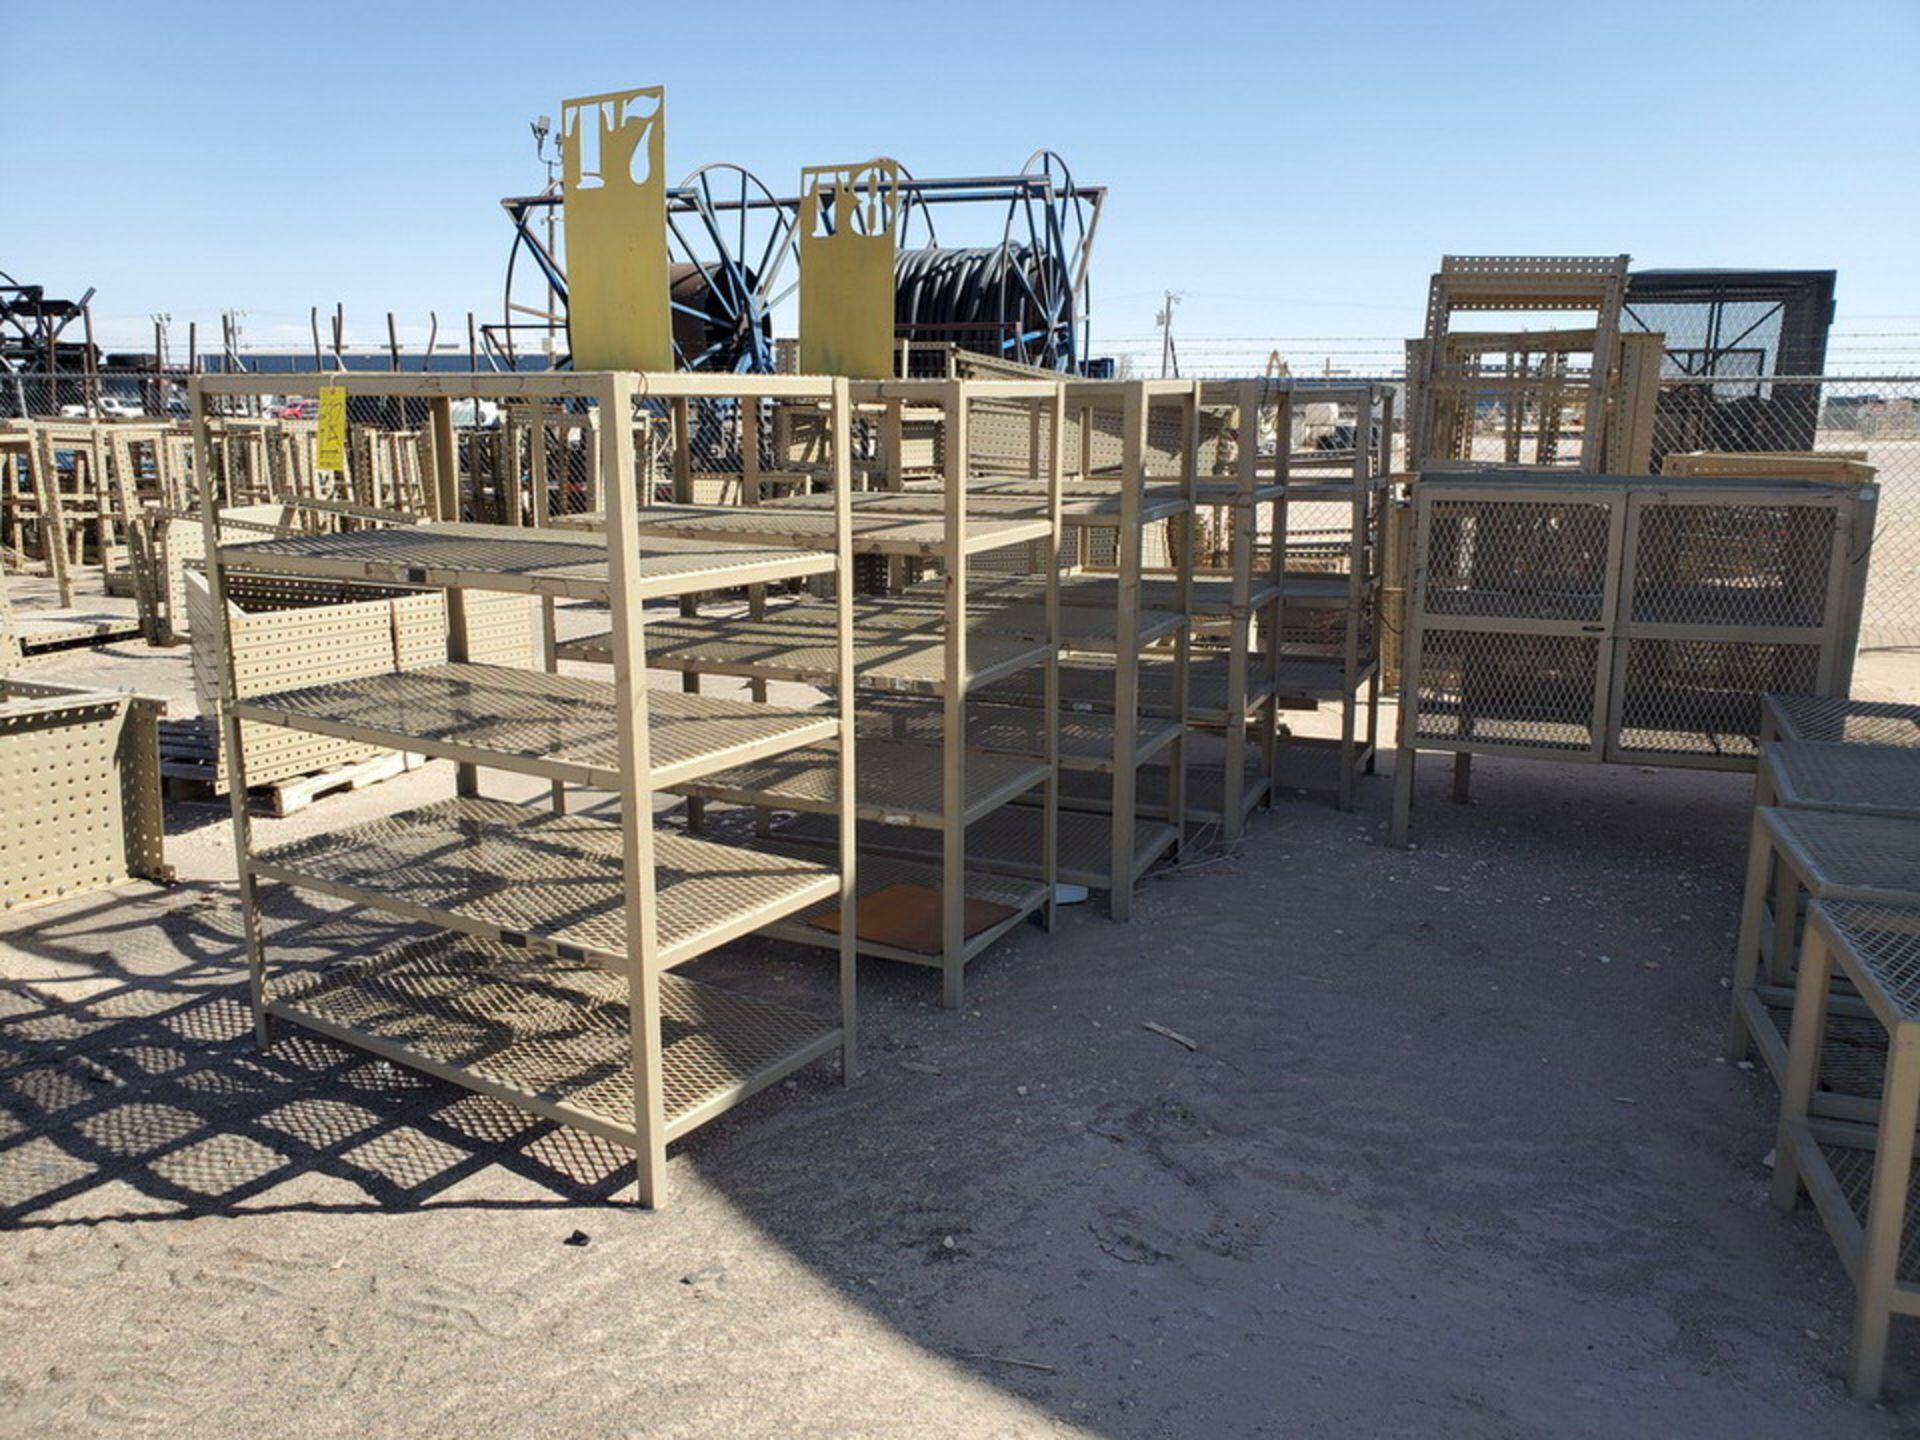 "Assorted Stl Matl. Racks & Ladders Size Range: 30"" x 26"" x 25""H - 29"" x 48"" x 50""H - Image 15 of 18"